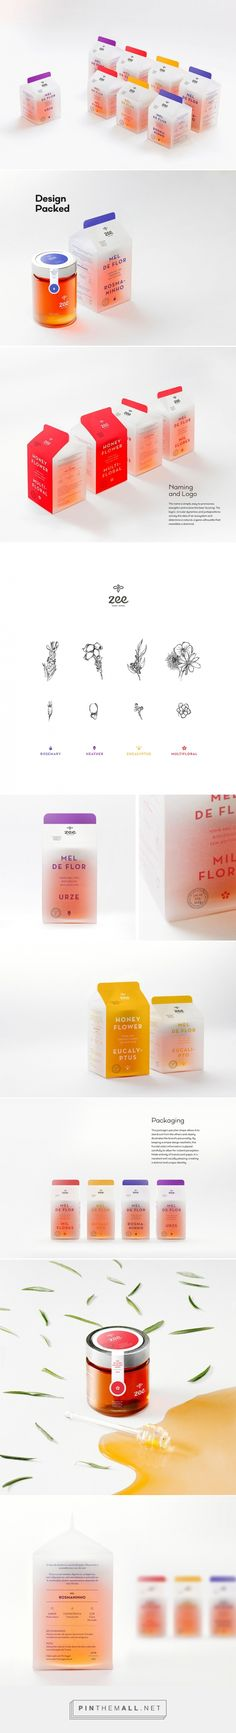 Zee Honey Goods packaging design by gen design studio (Portugal) - http://www.packagingoftheworld.com/2016/06/zee-honey-goods.html